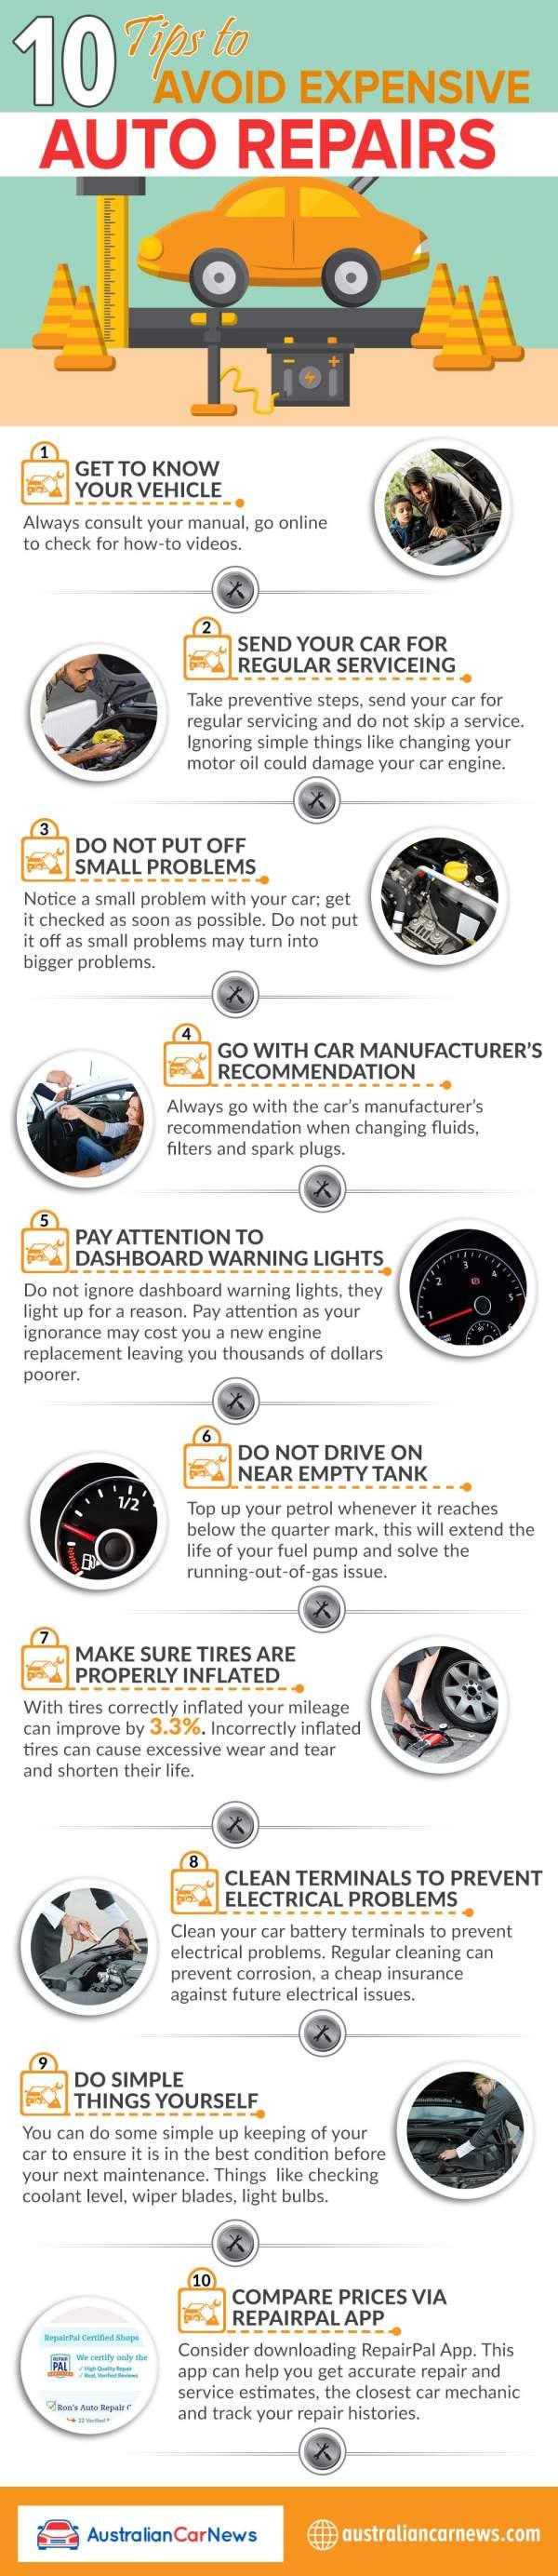 Australian-Car-News-and-Reviews-Vehicle-Maintenance-Tips-infographic-lkrllc